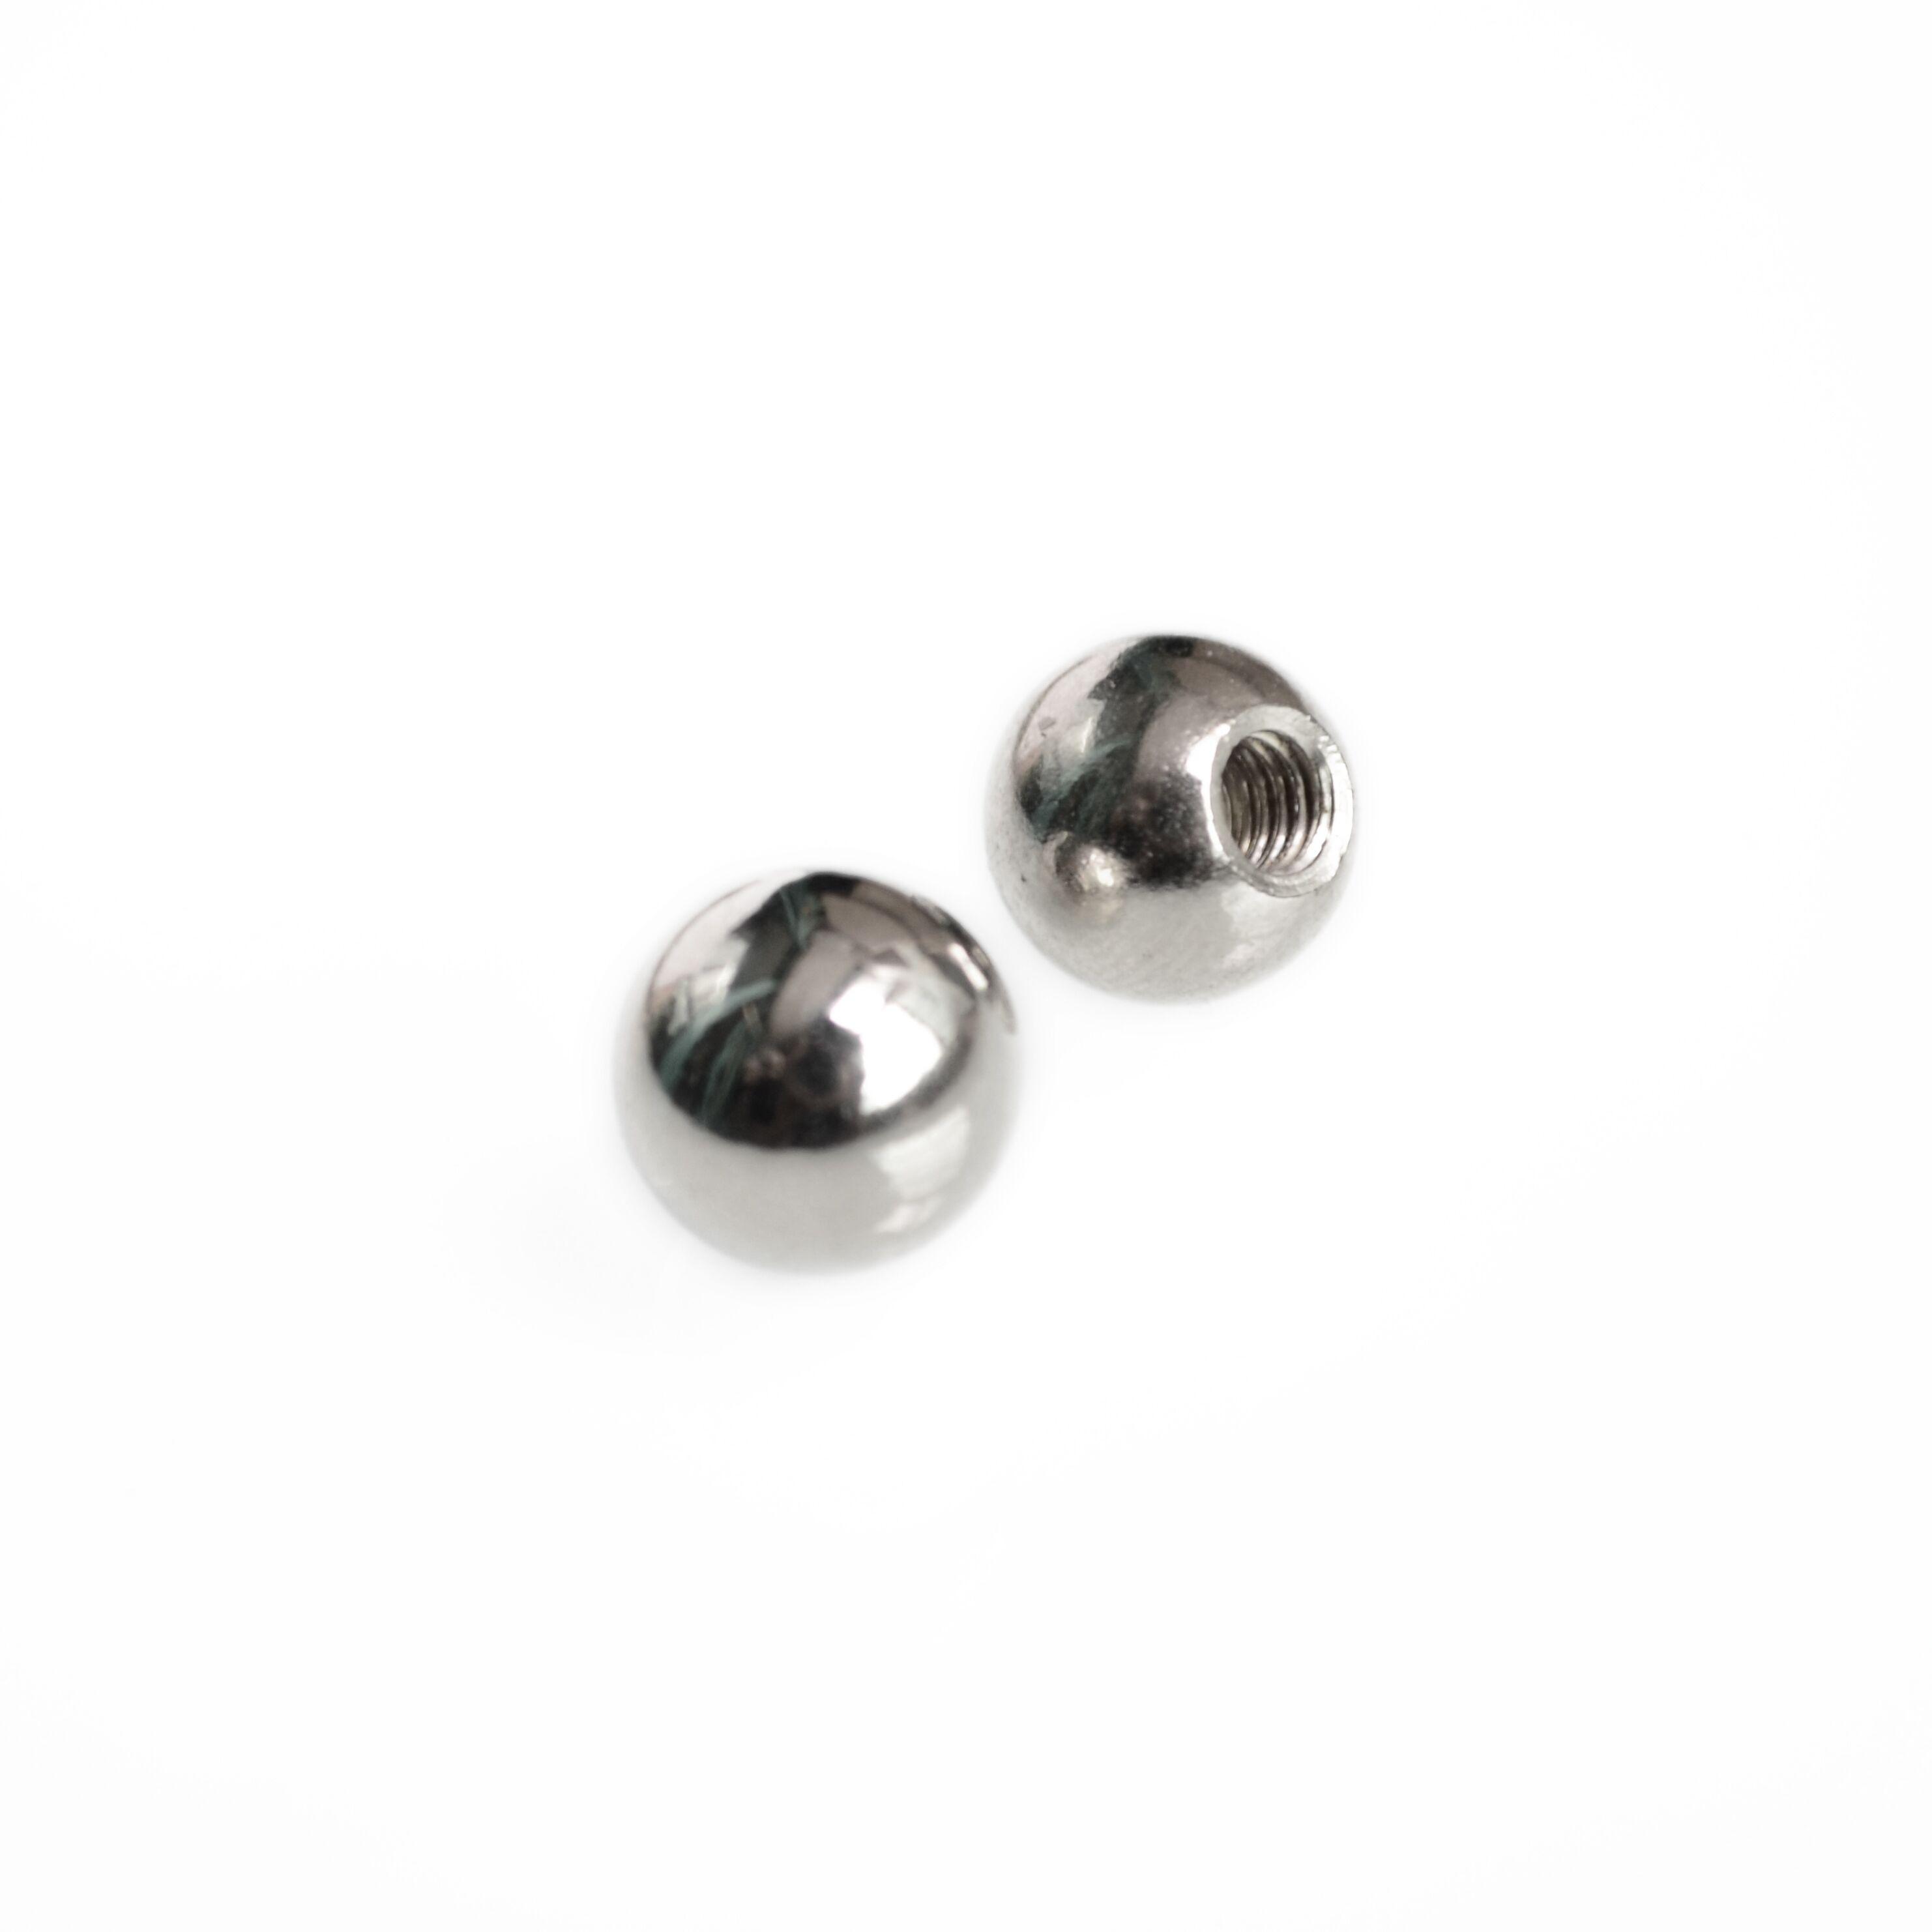 16Pcs /Φ10 M4 Threaded Steel Ball Rod Ends for Kossel 3D Printer Joints Threaded Ball Joint Stainless Steel Threaded Ball Threaded Balls